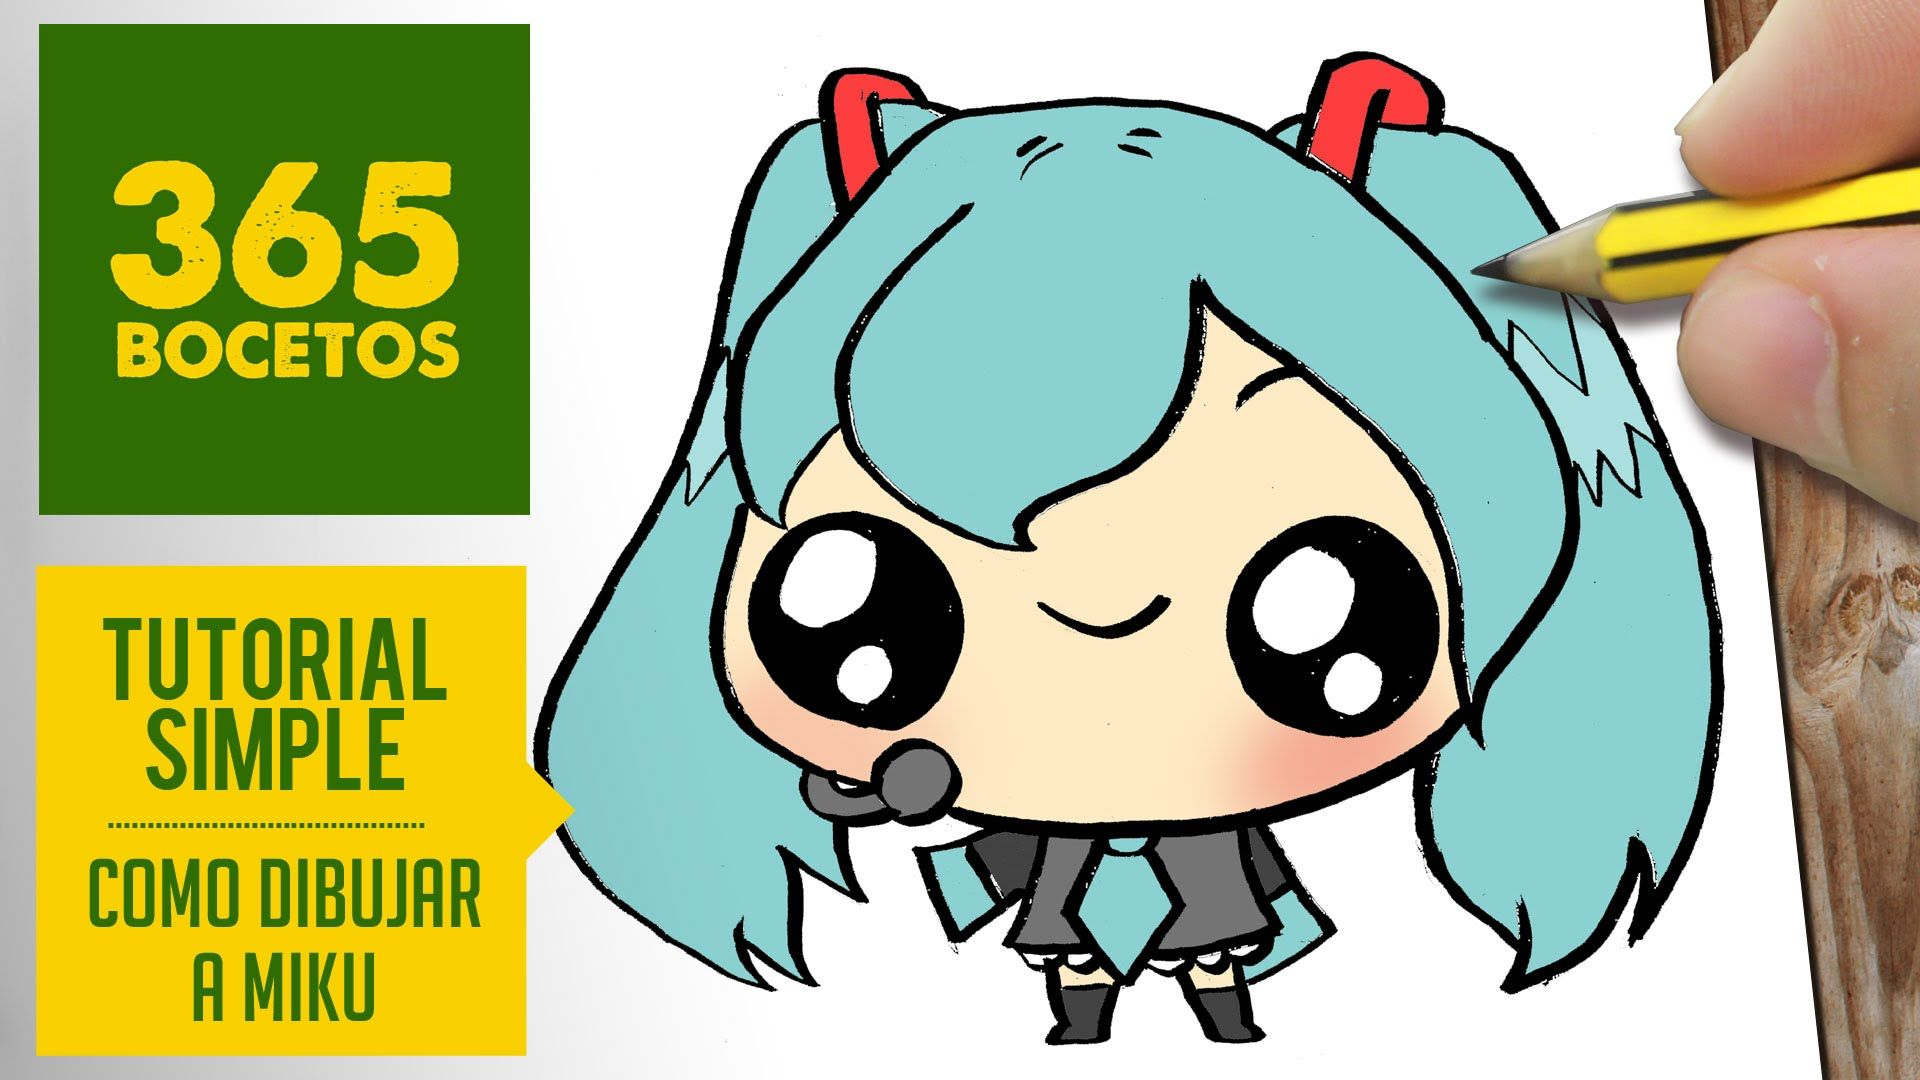 Miku Anime Con Imagenes Dibujos Kawaii Bocetos De